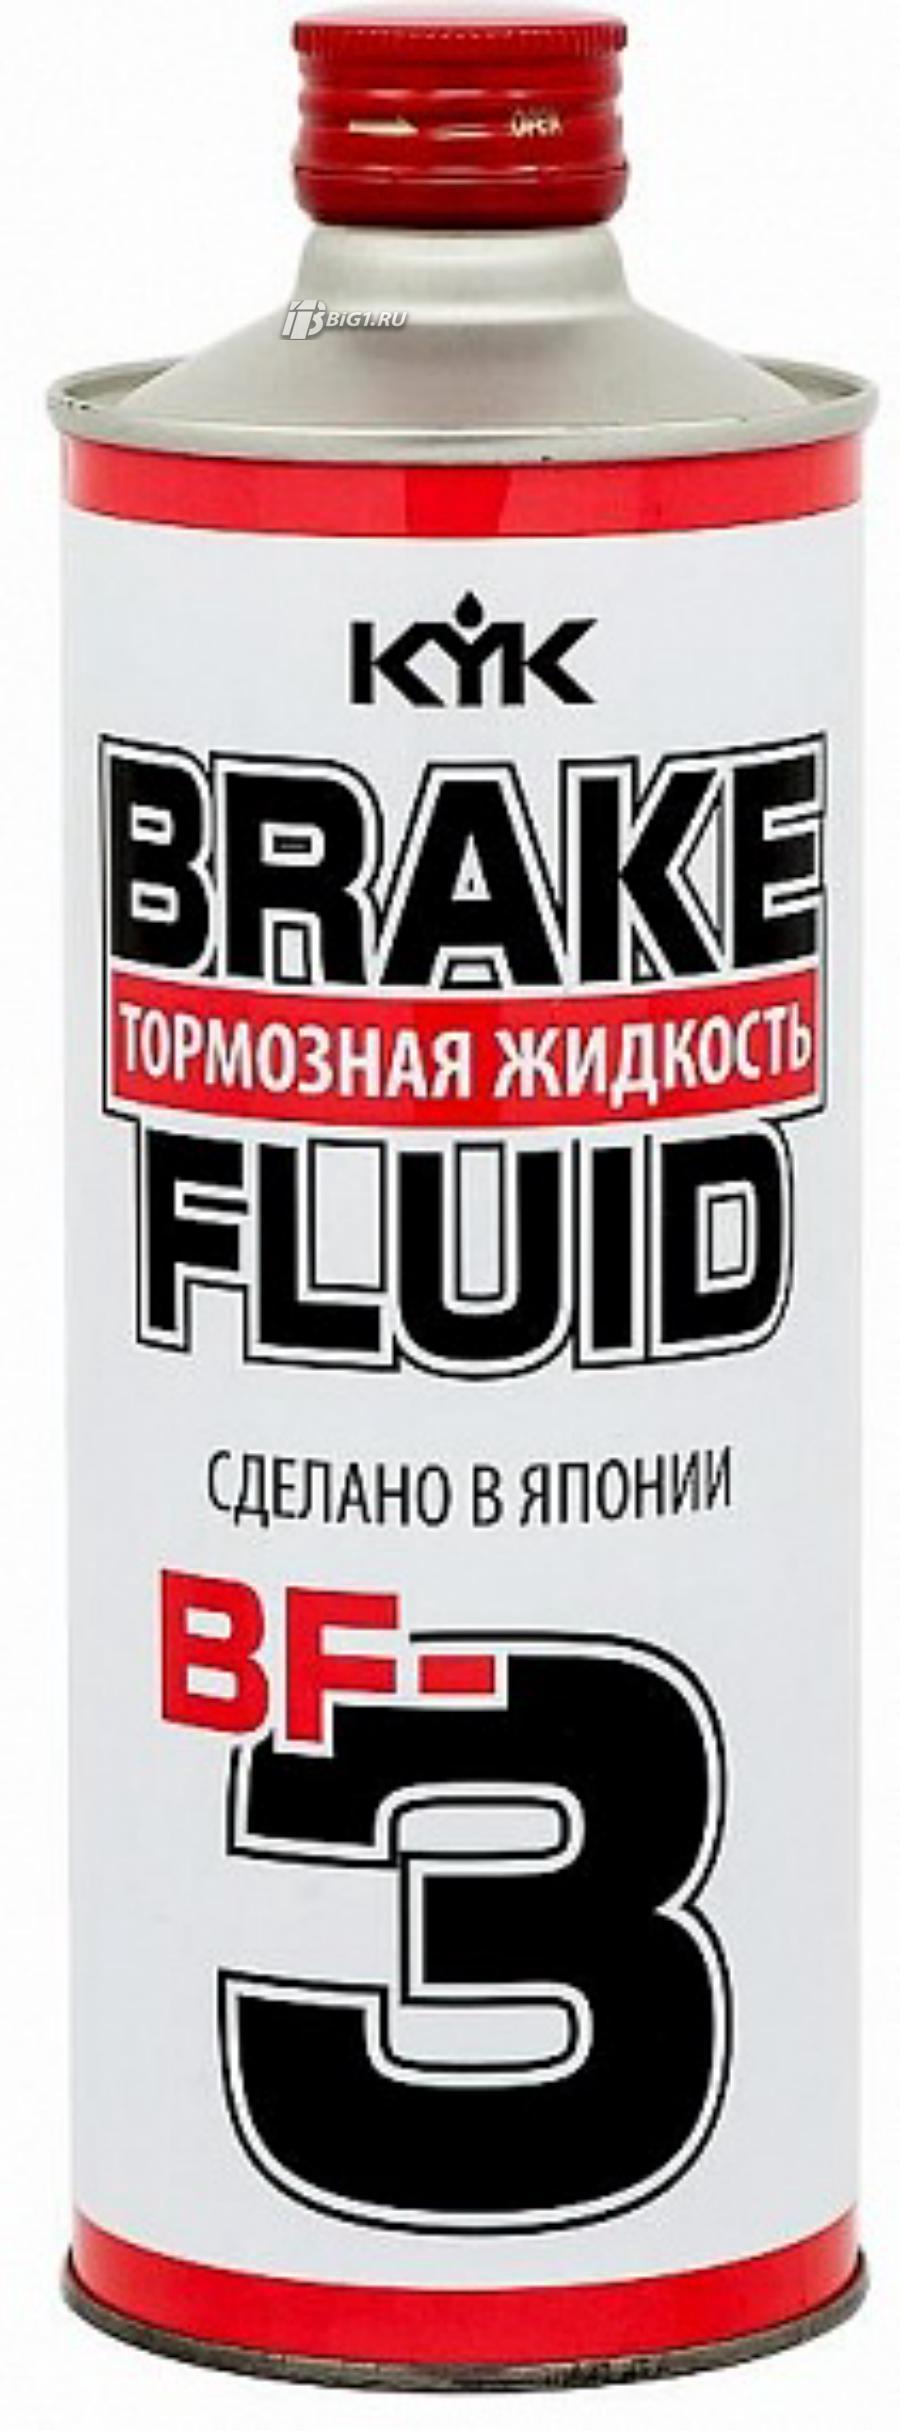 Жидкость тормозная dot 3, 'Brake Fluid BF-3', '0,5л